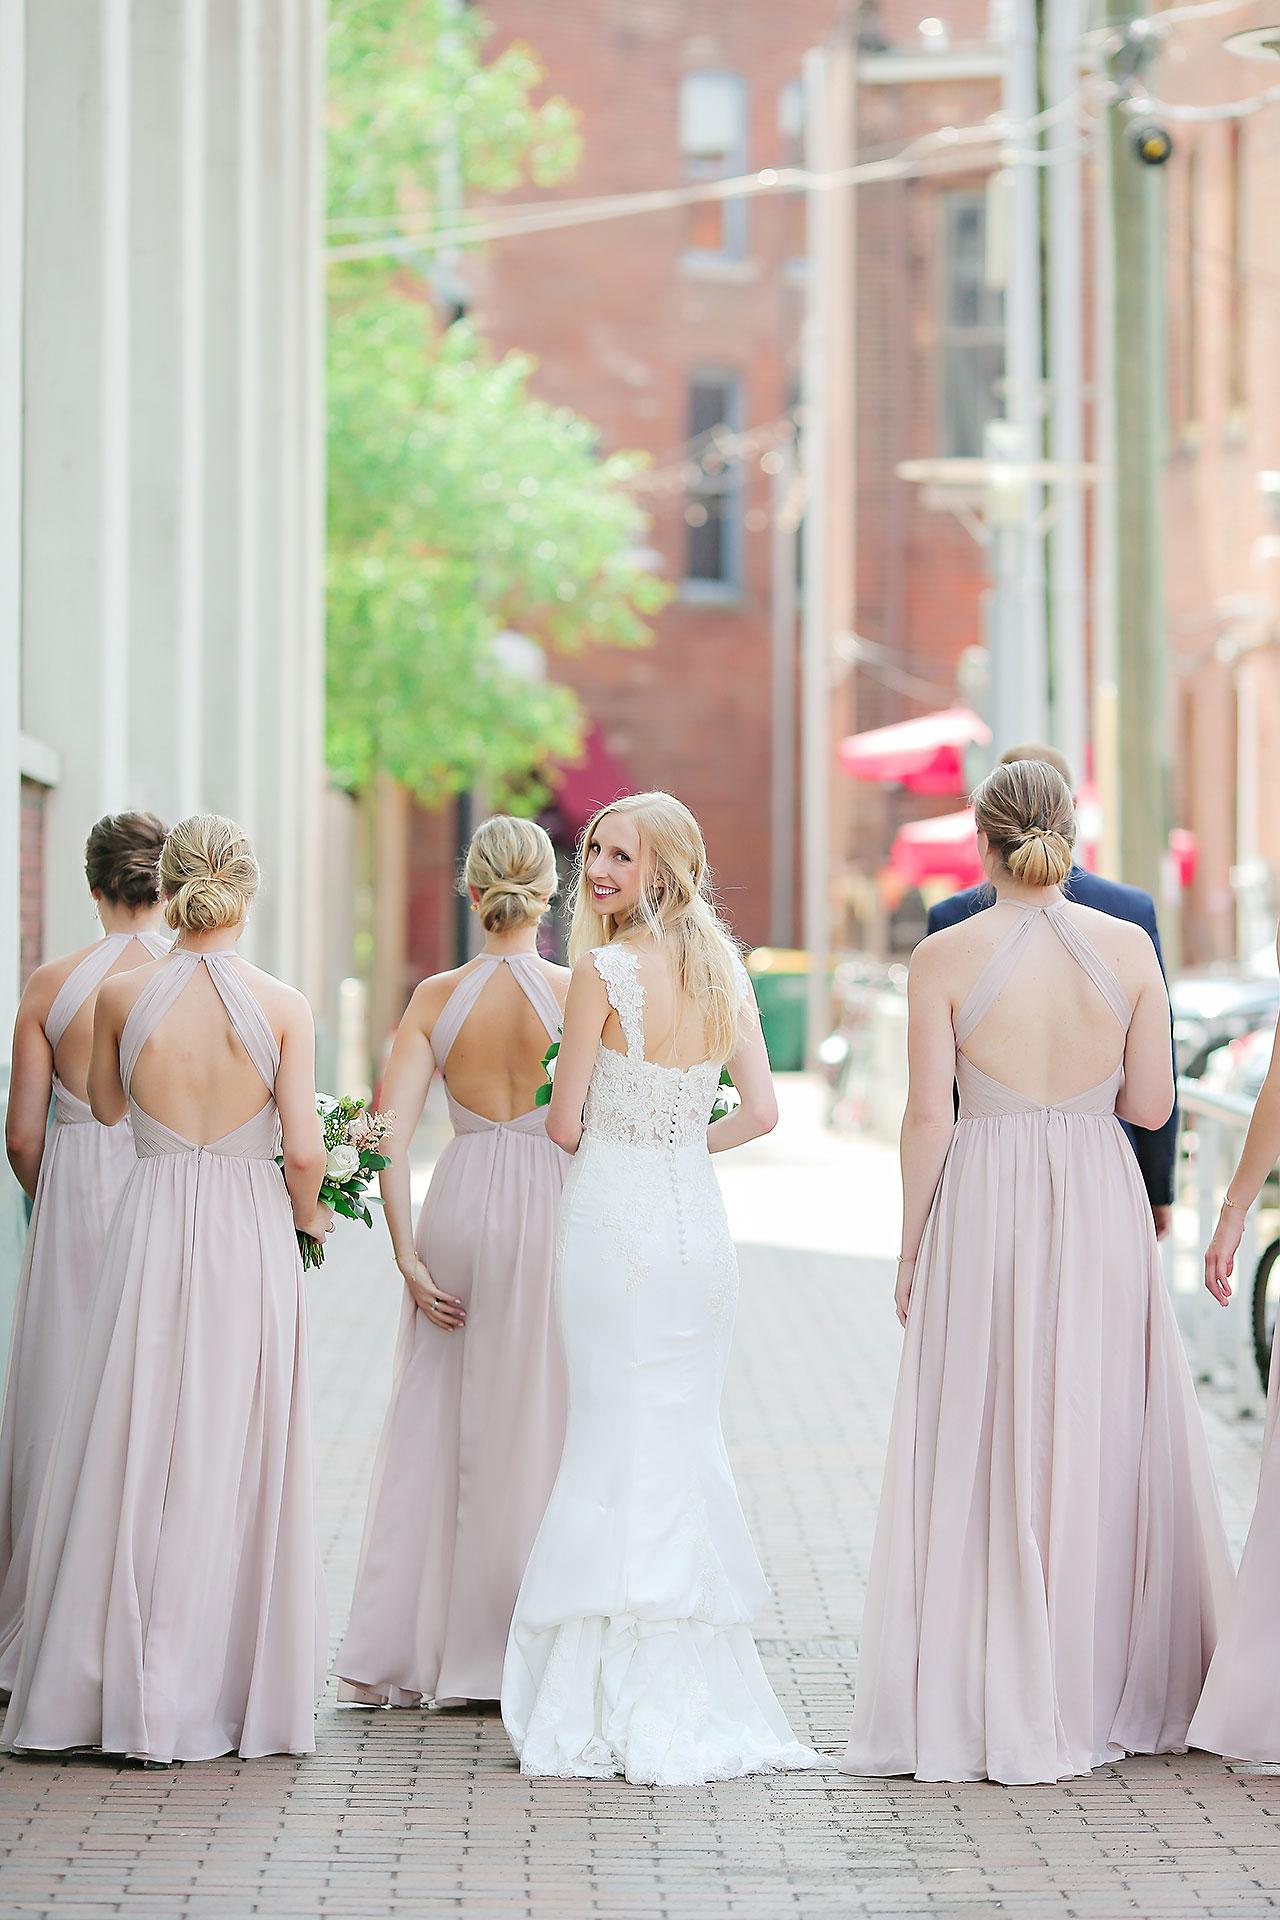 Molly Declan Scottish Rite Indianapolis Wedding 110